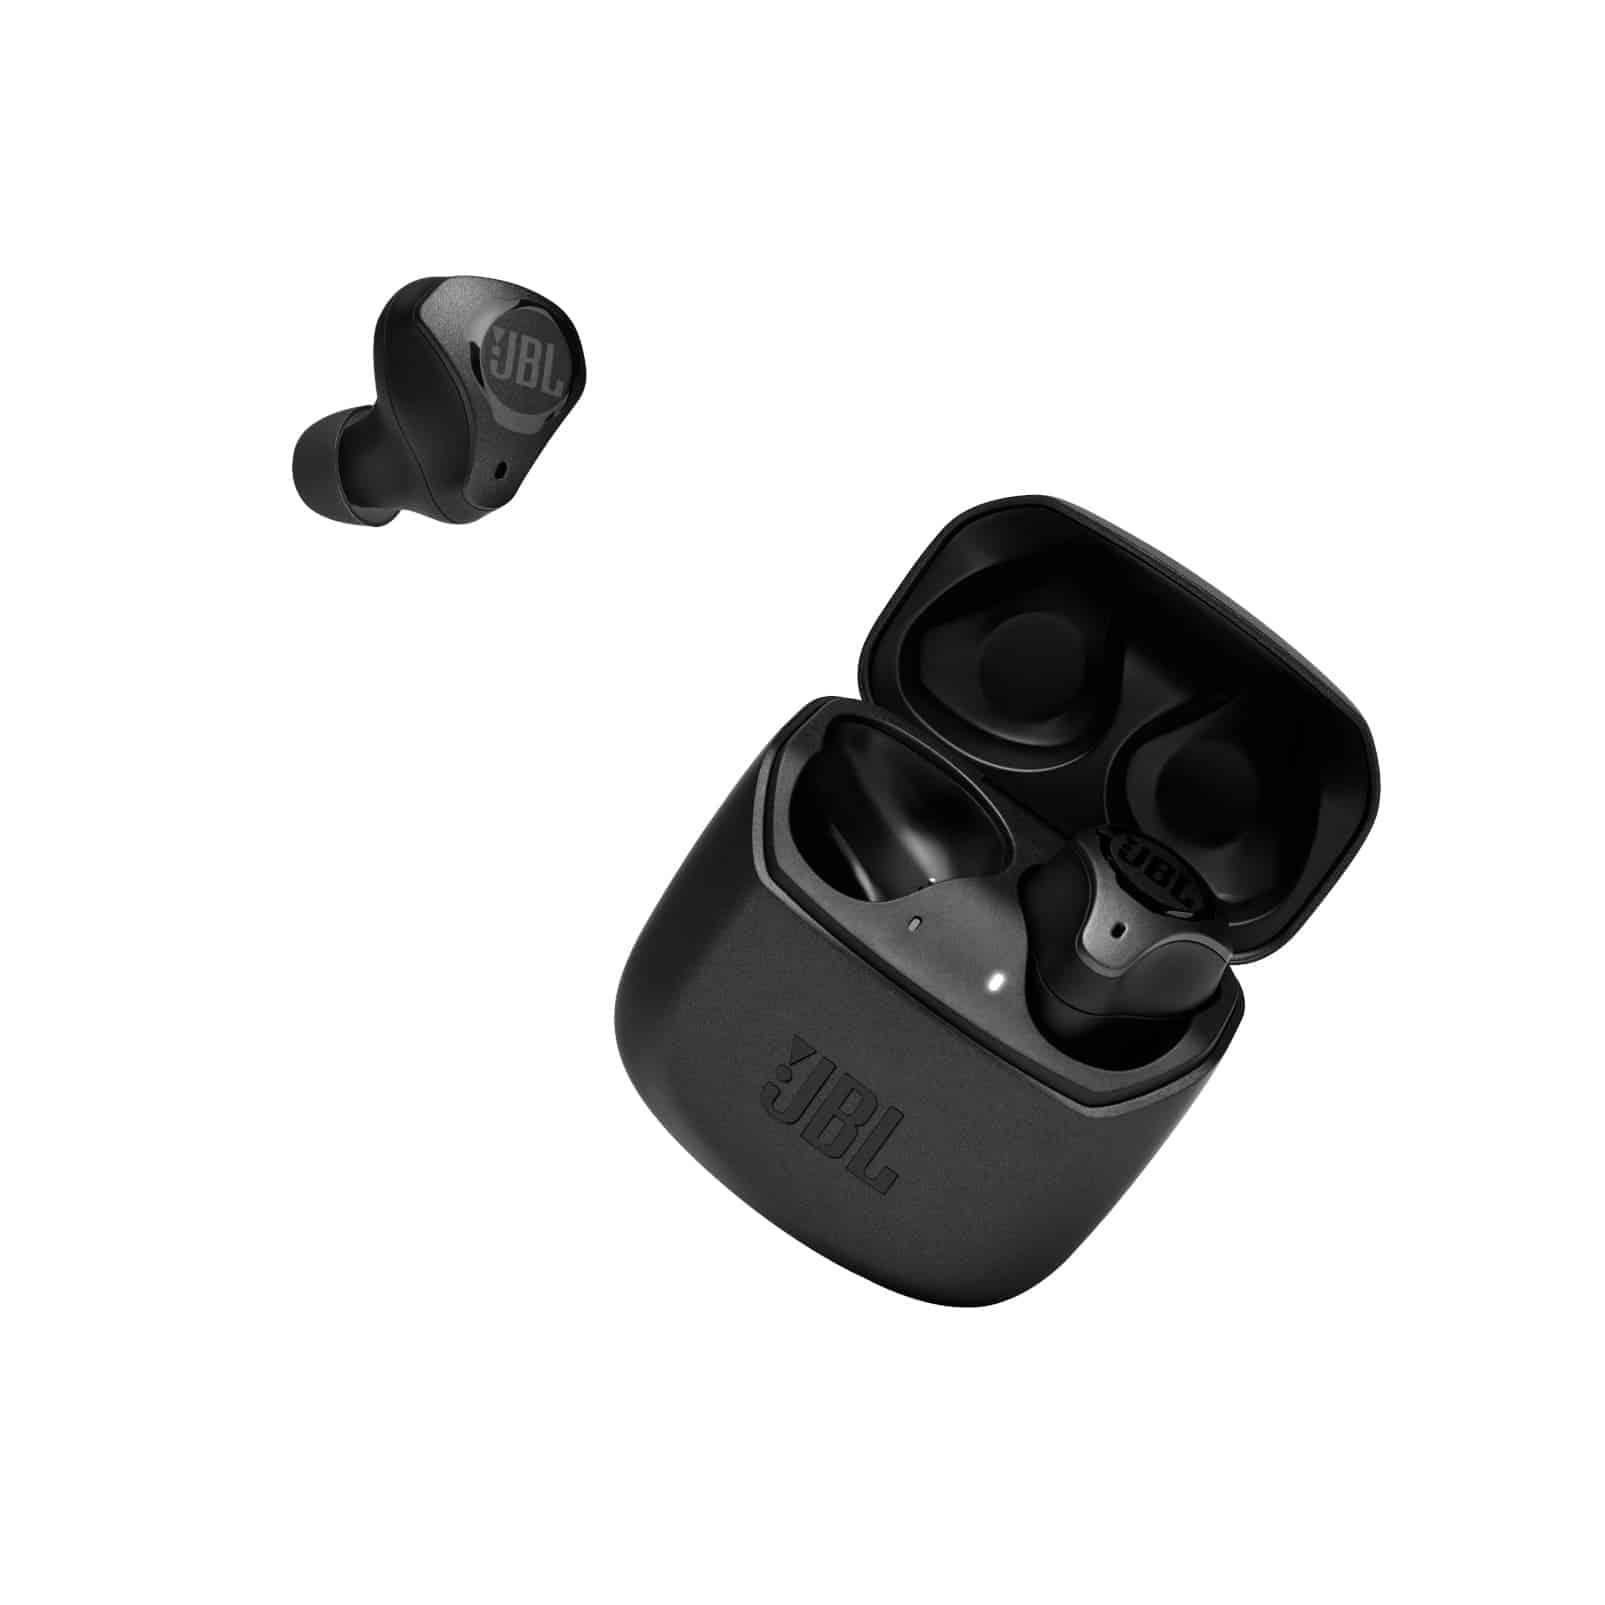 JBL Club Pro True Wireless Earbuds 5